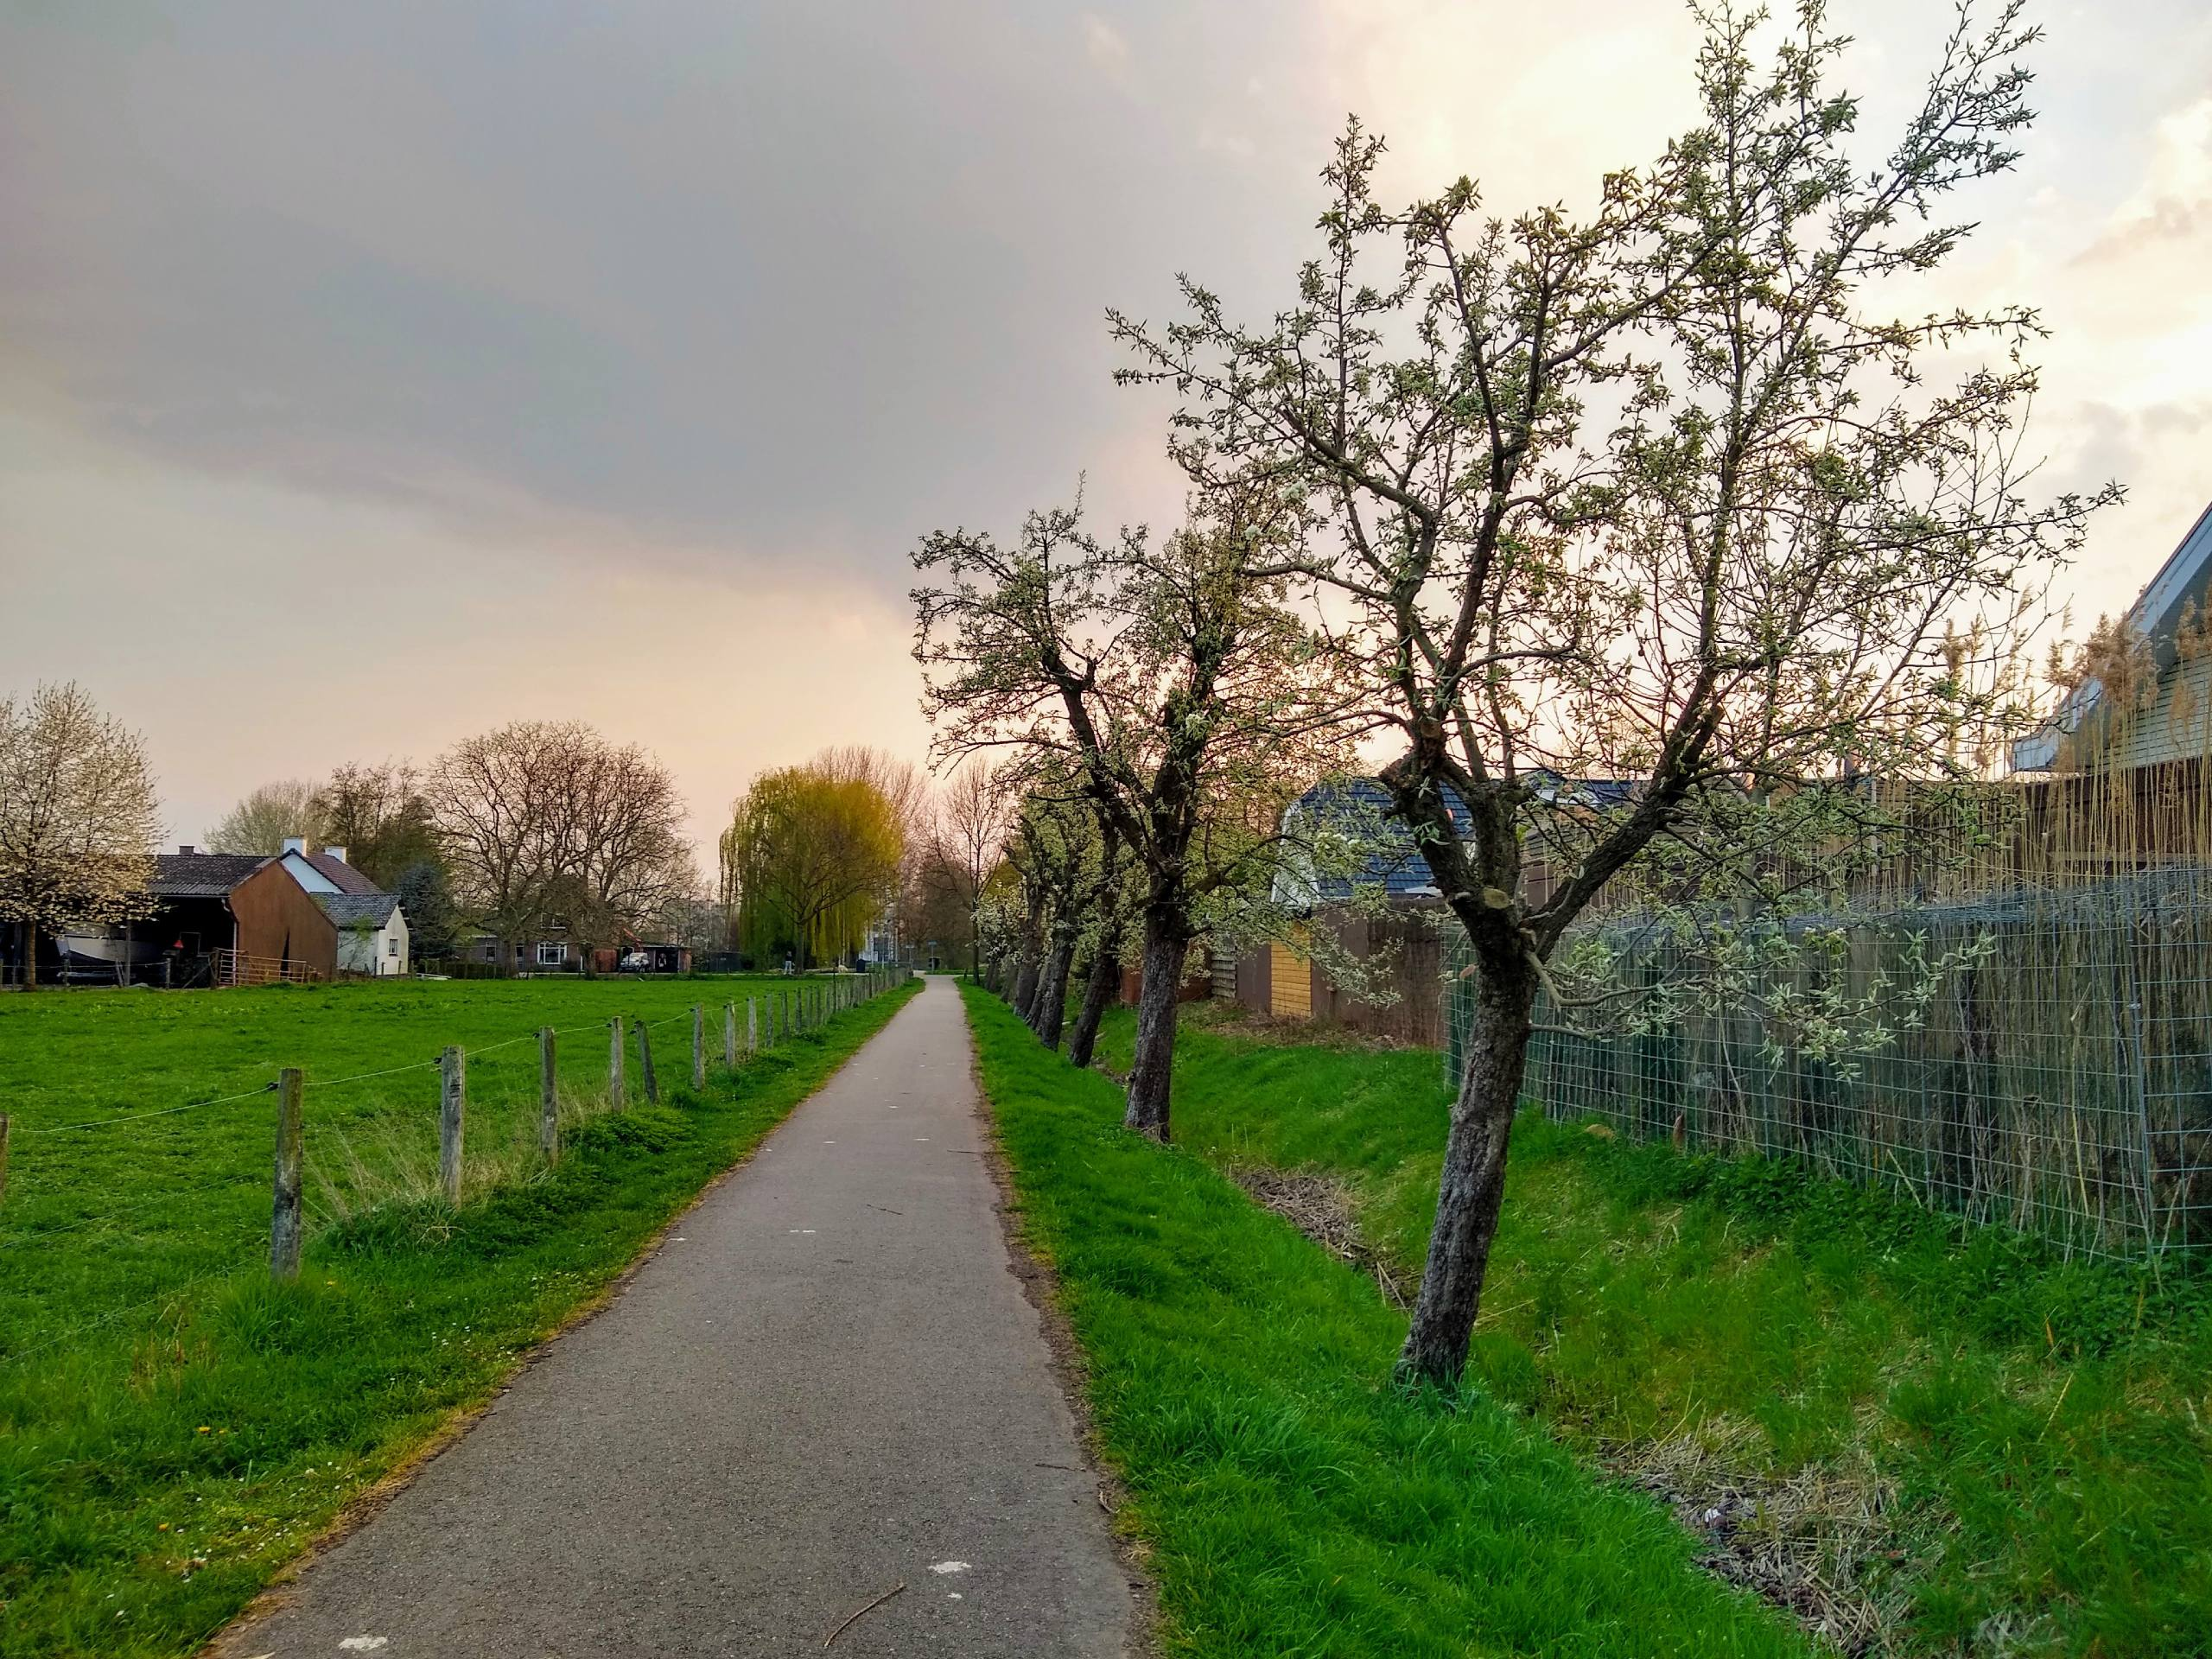 Pear trees along the biking path